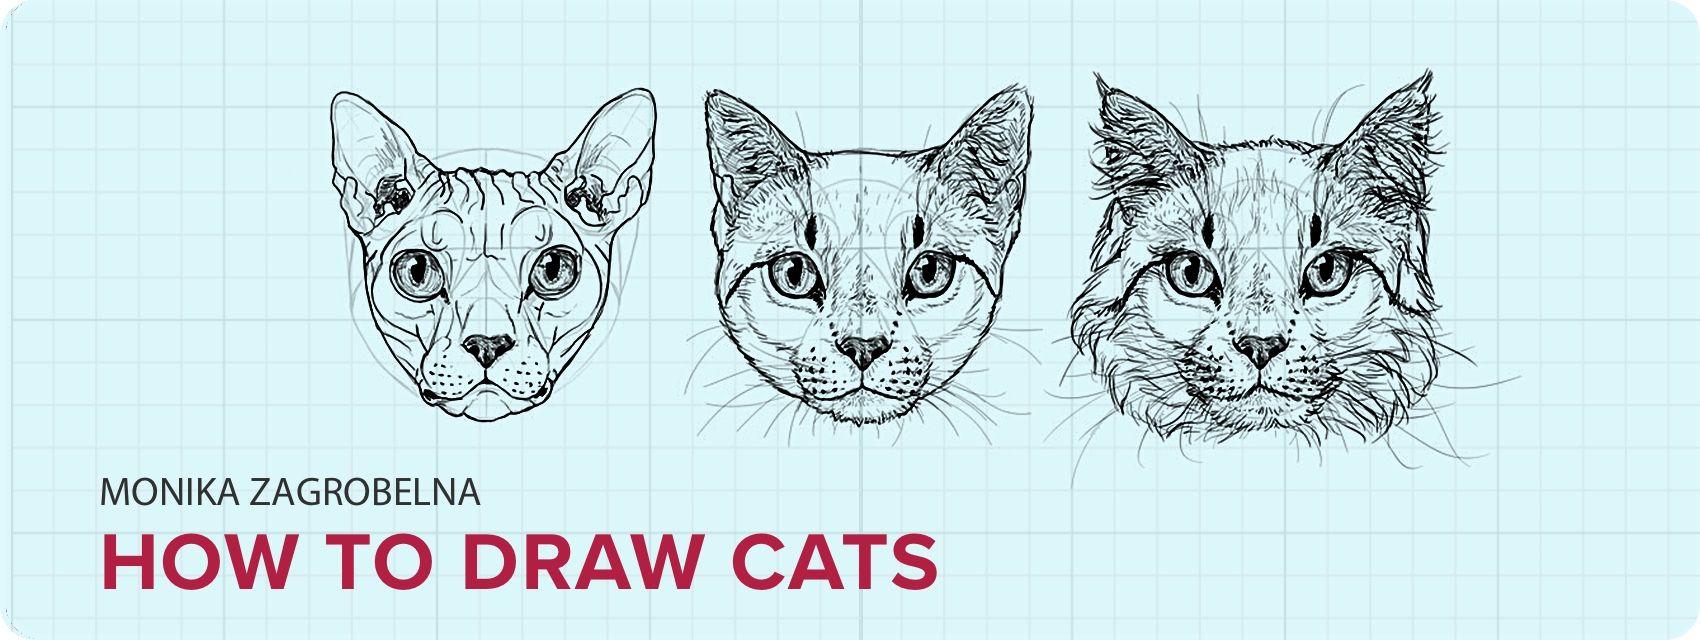 How to Draw Cats: Monika Zagrobelna\'s Detailed Approach — Monika ...